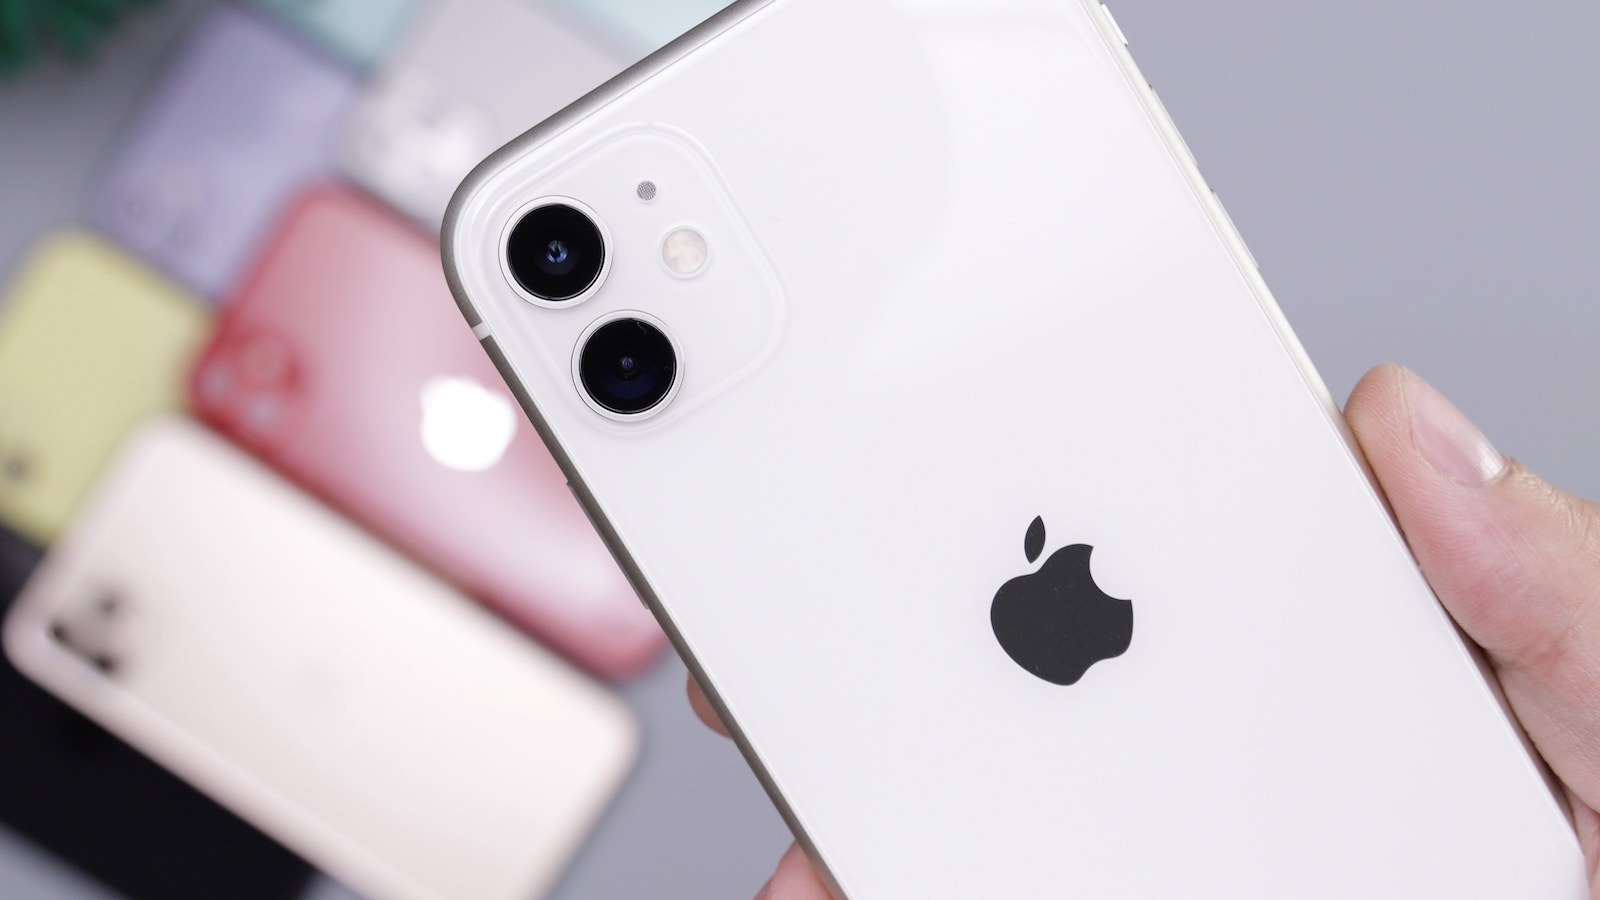 daniel-romero-yl5mP6gcPoc-unsplash-multiple-iphones.jpg